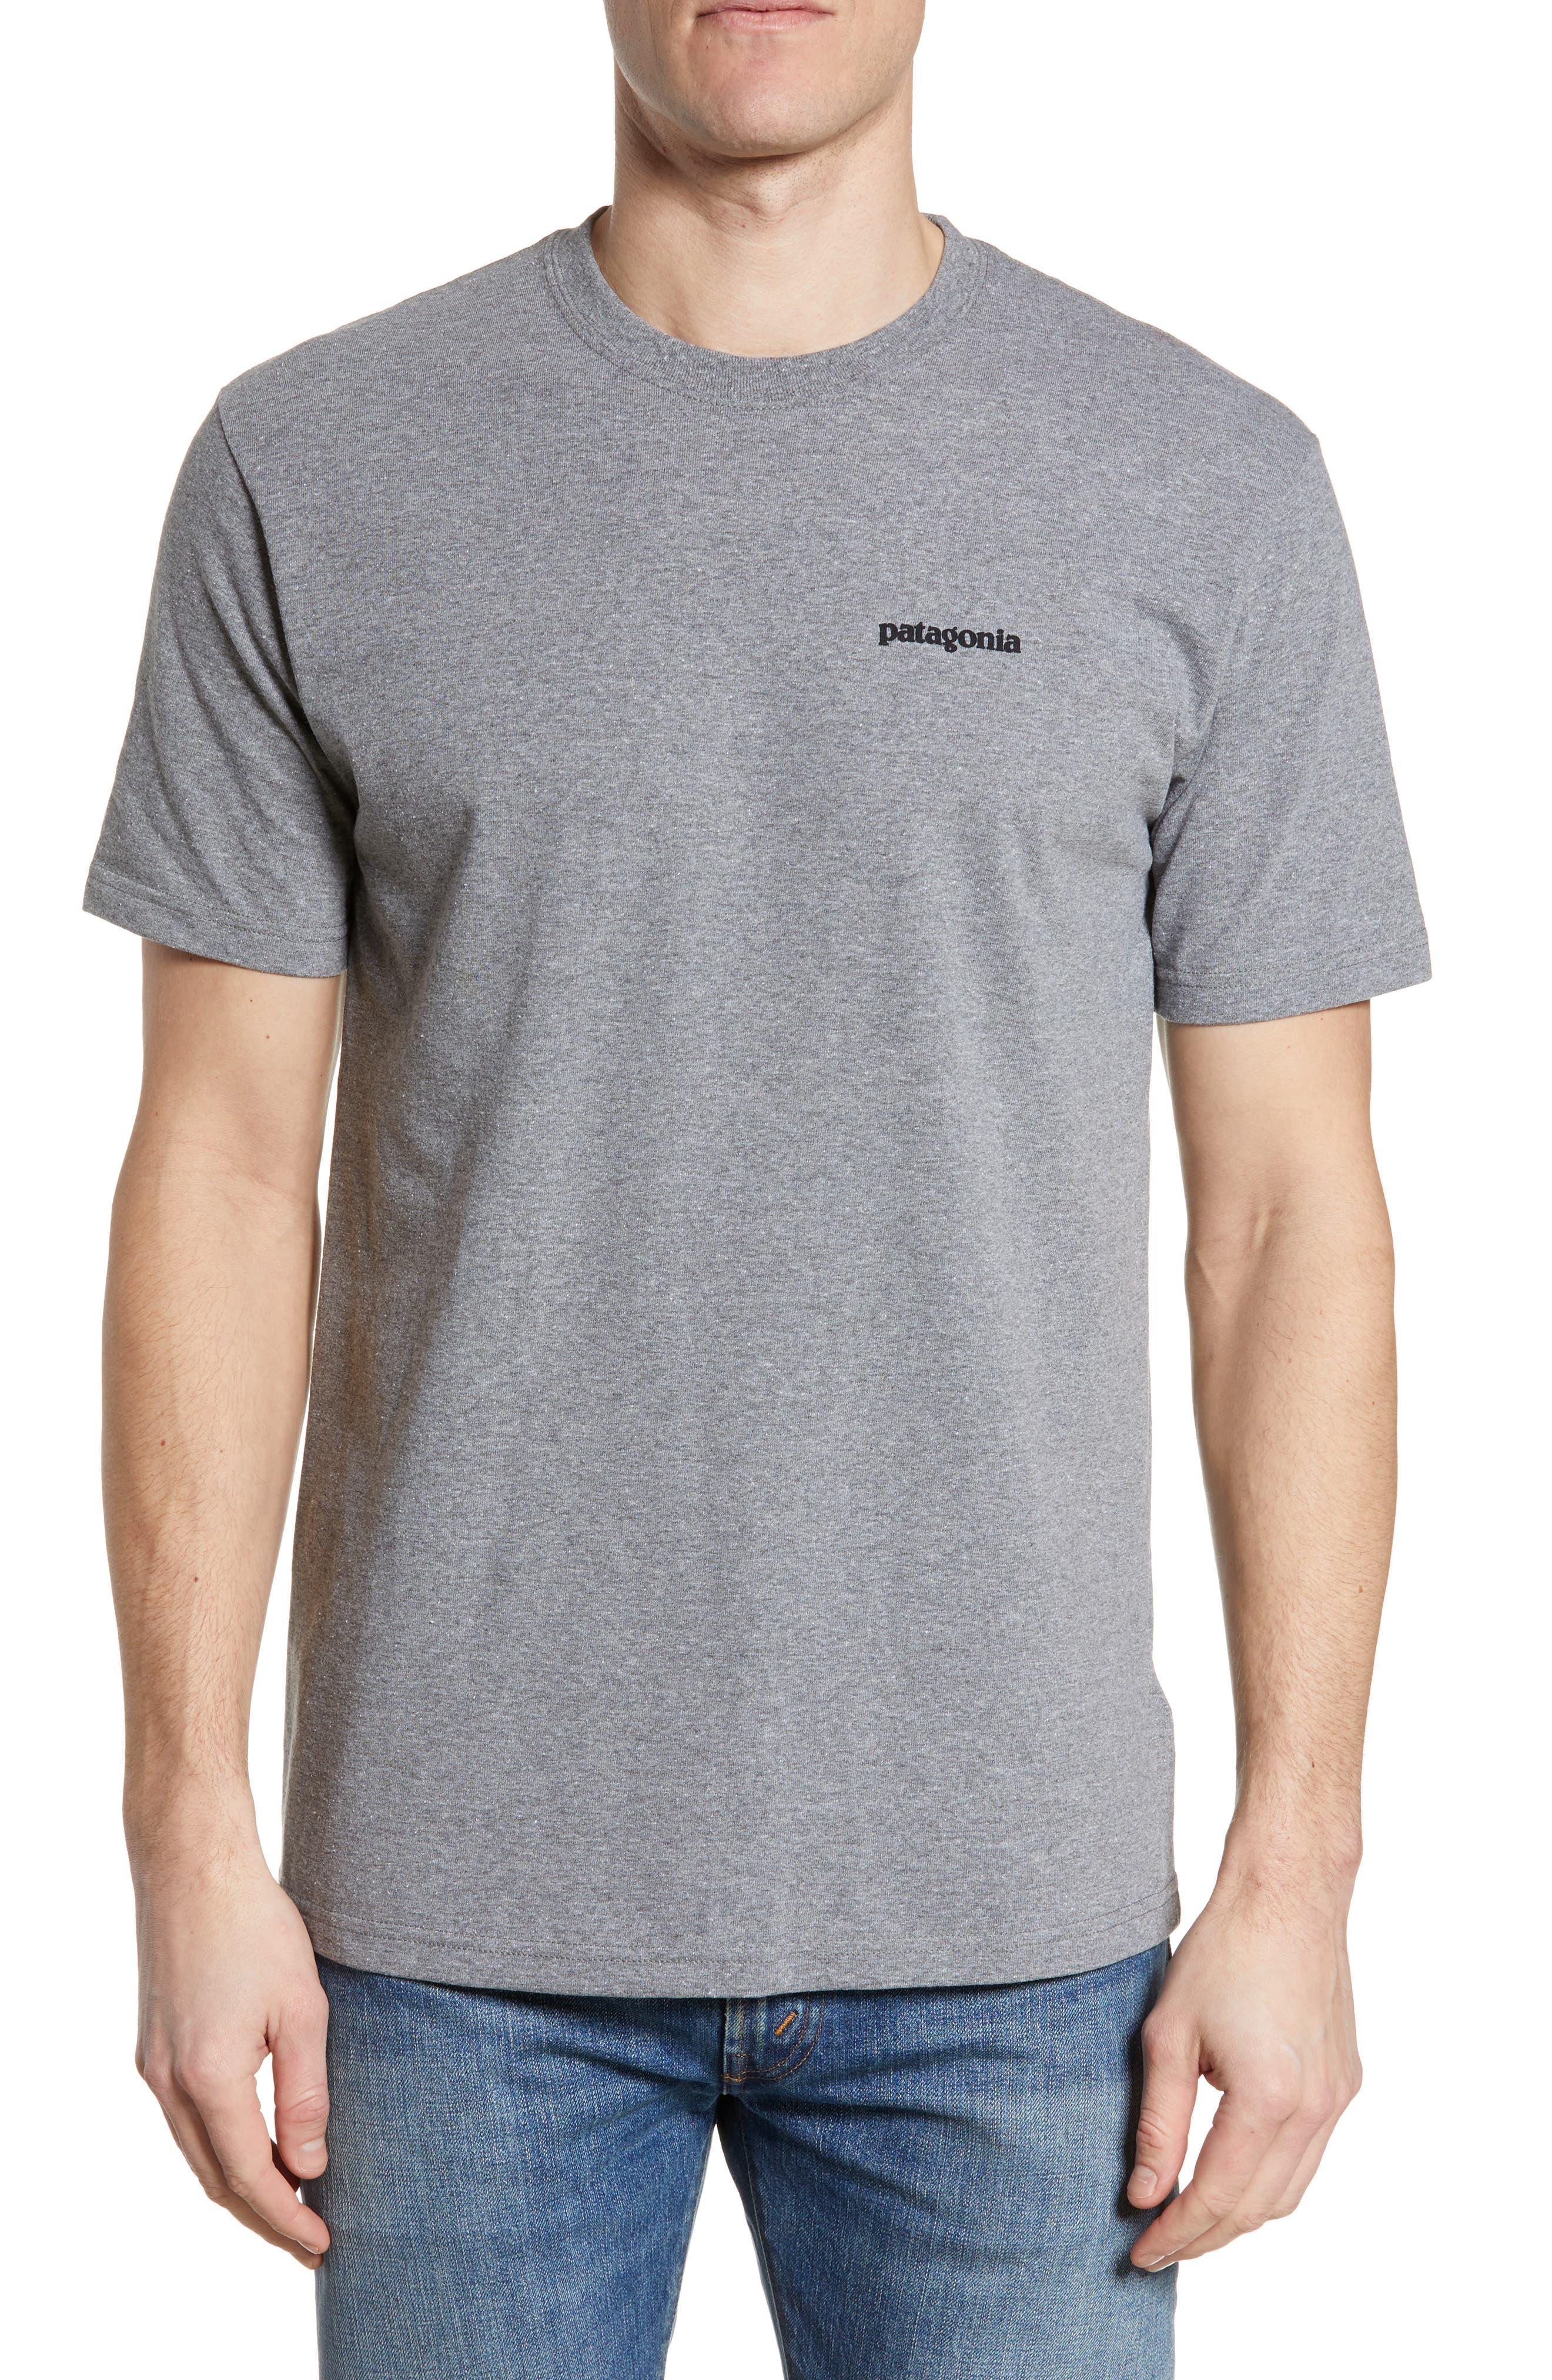 PATAGONIA Fitz Roy Trout Crewneck T-Shirt, Main, color, GRAVEL HEATHER